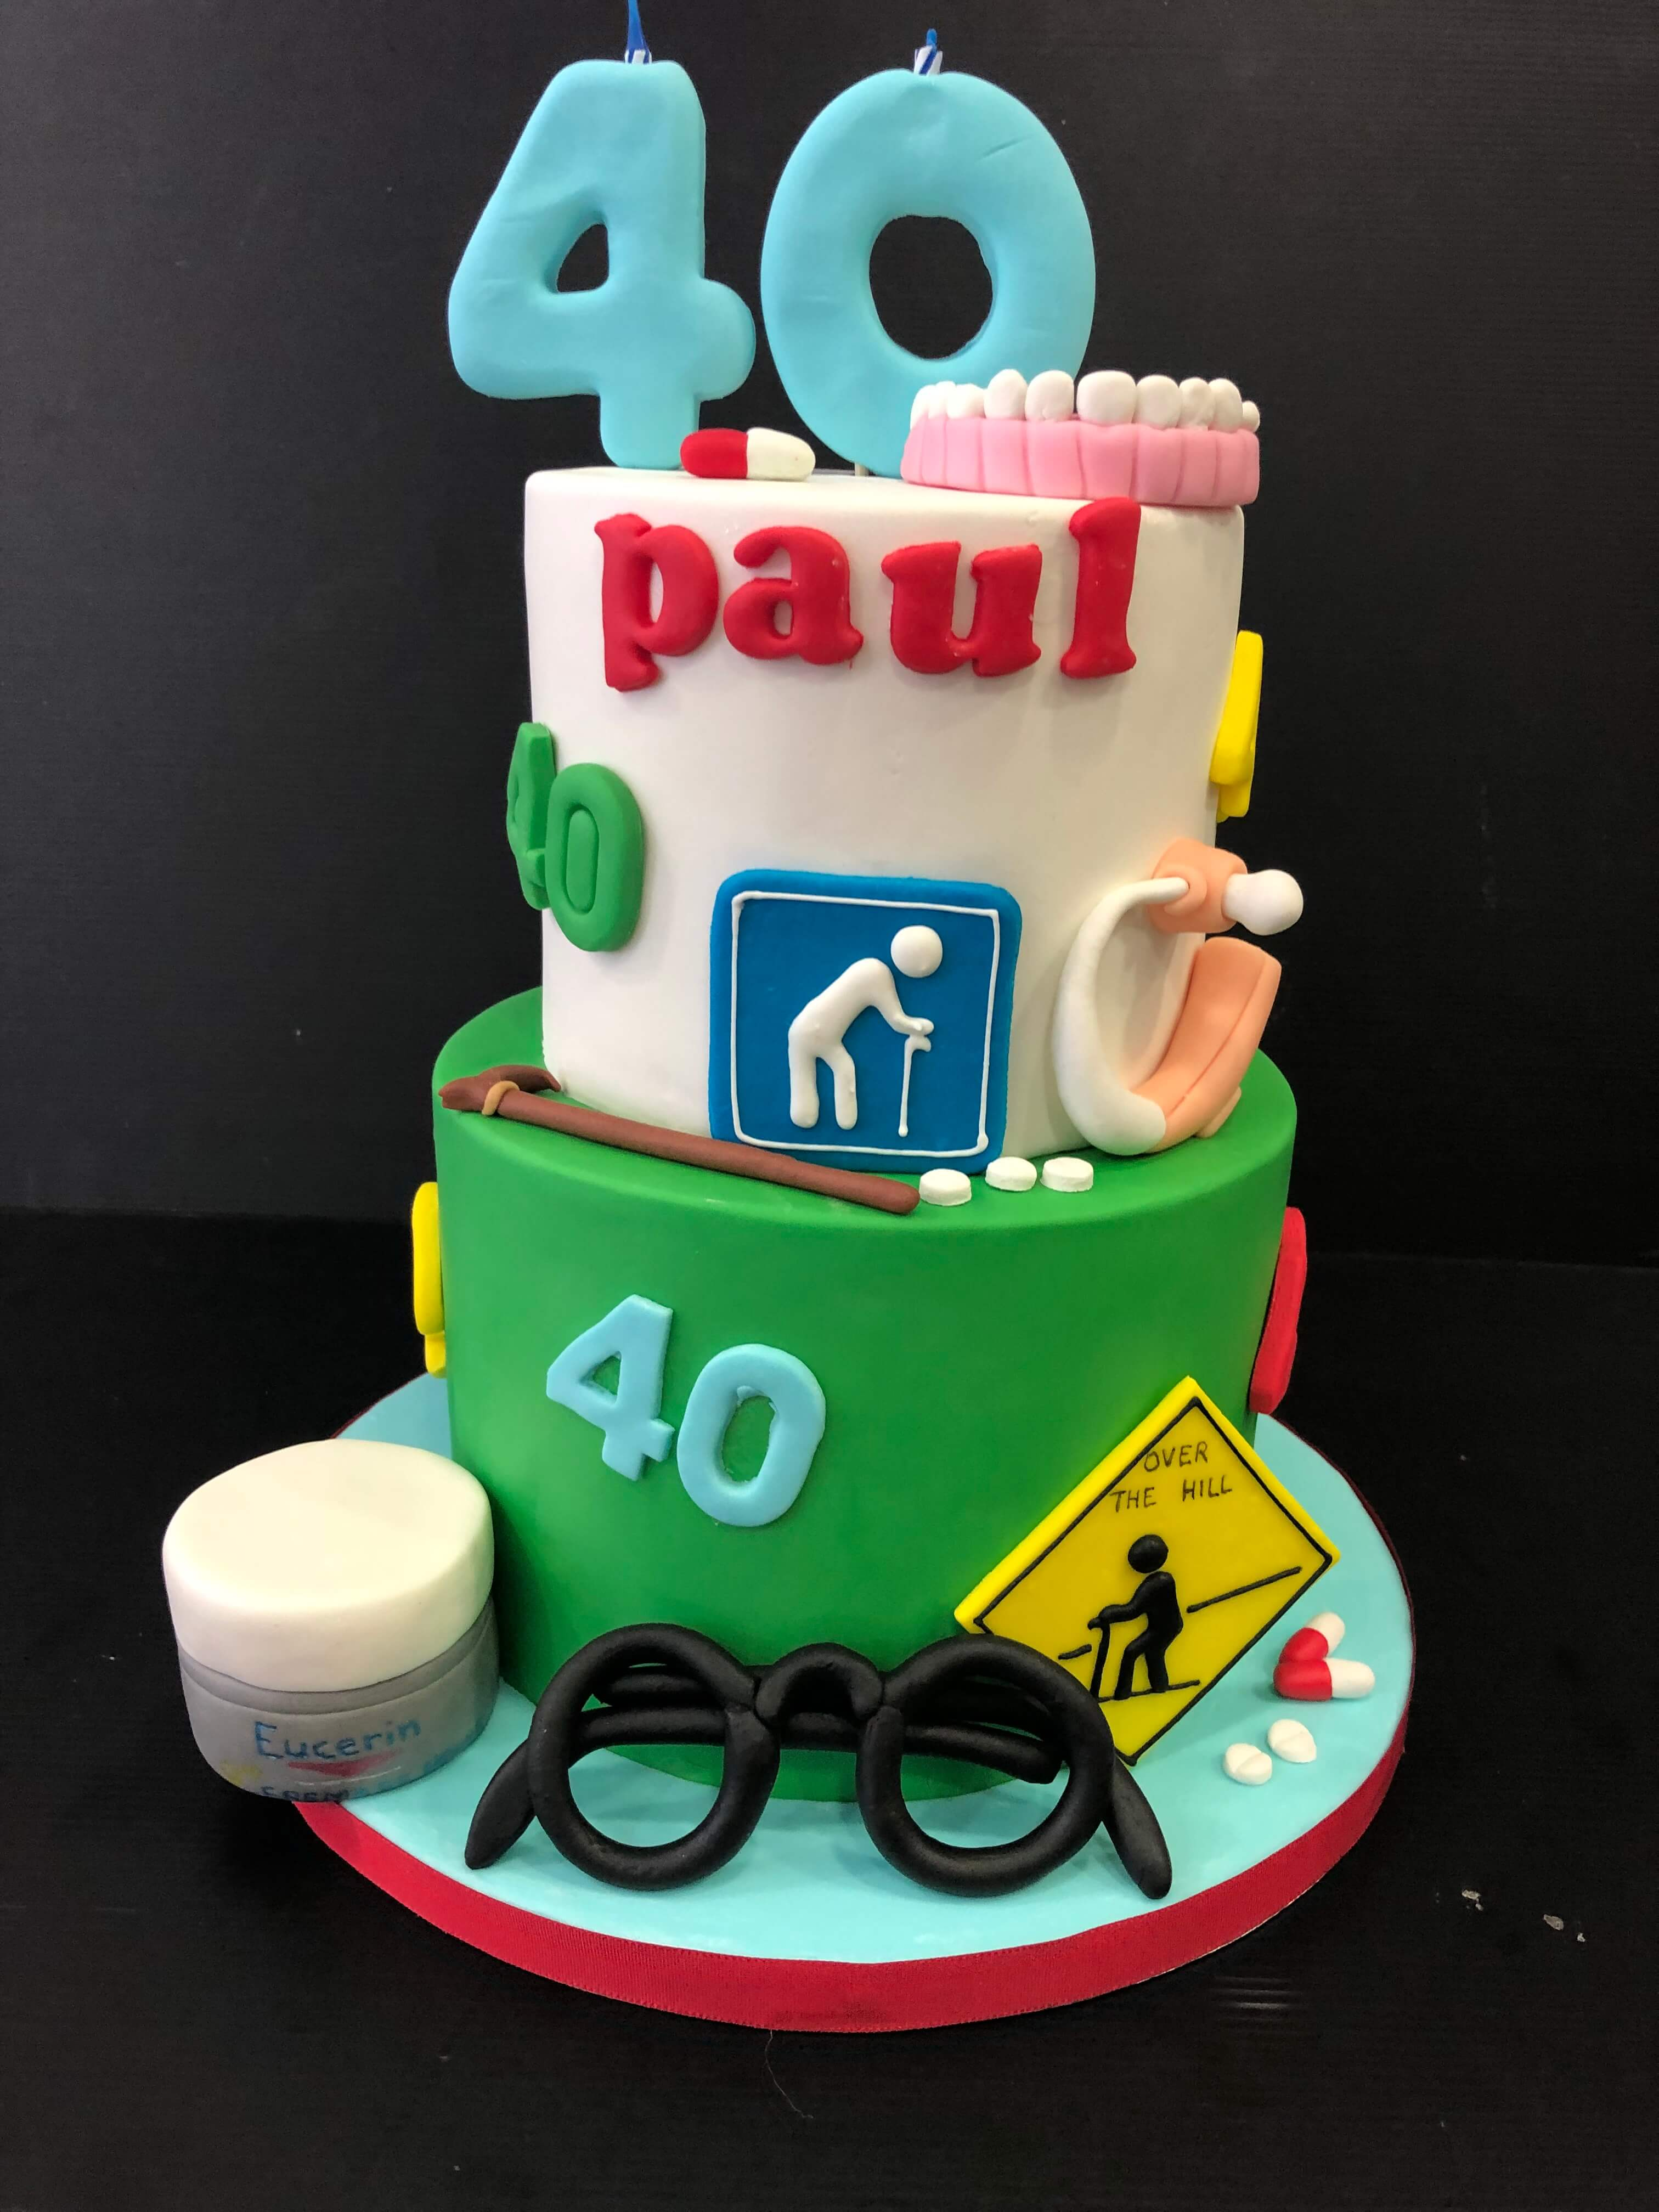 Tarta fondant cumpleaños dentista 40 coruña